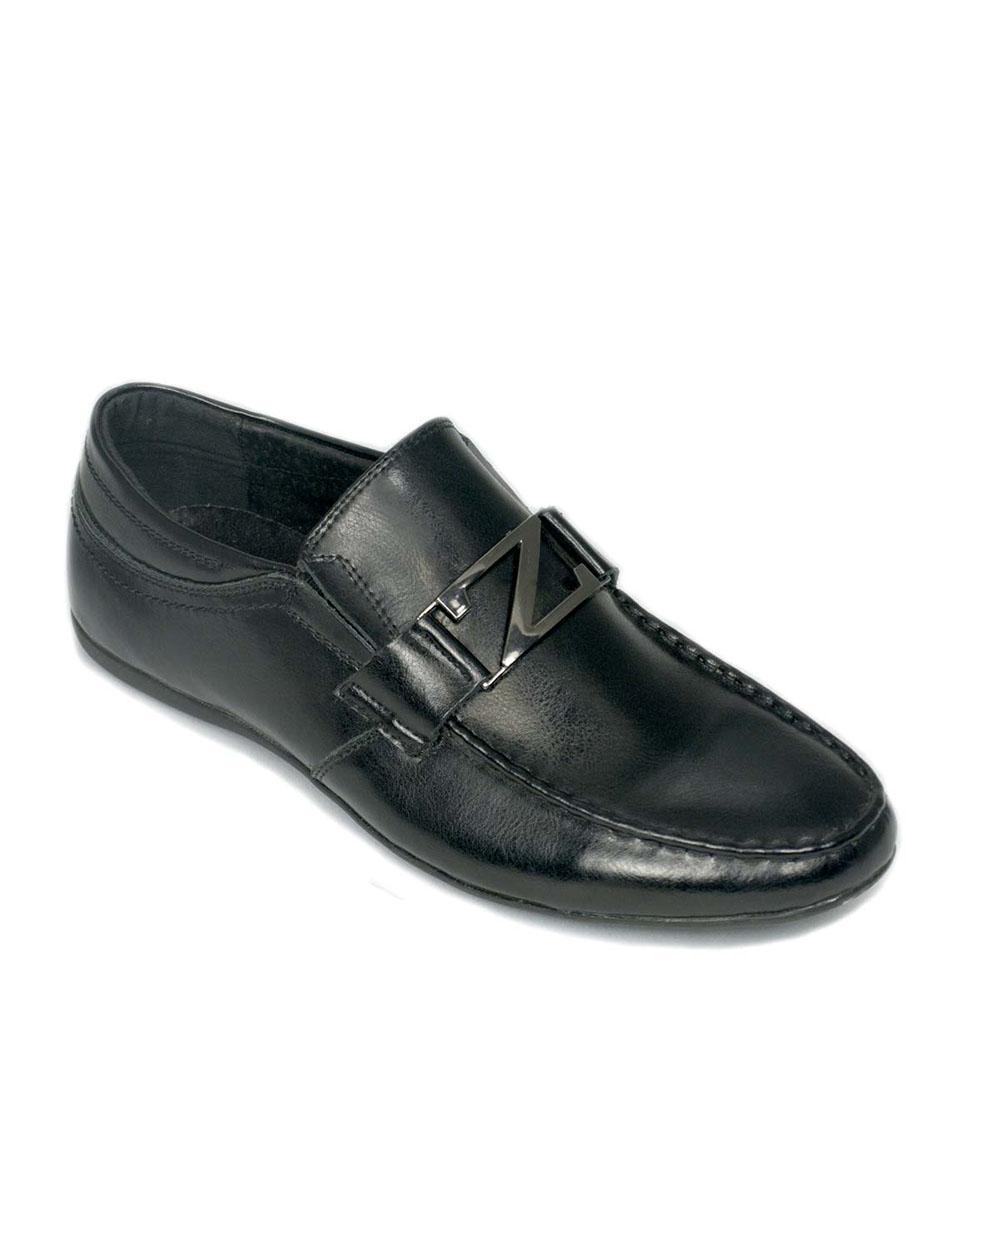 Туфли, мужские сумки